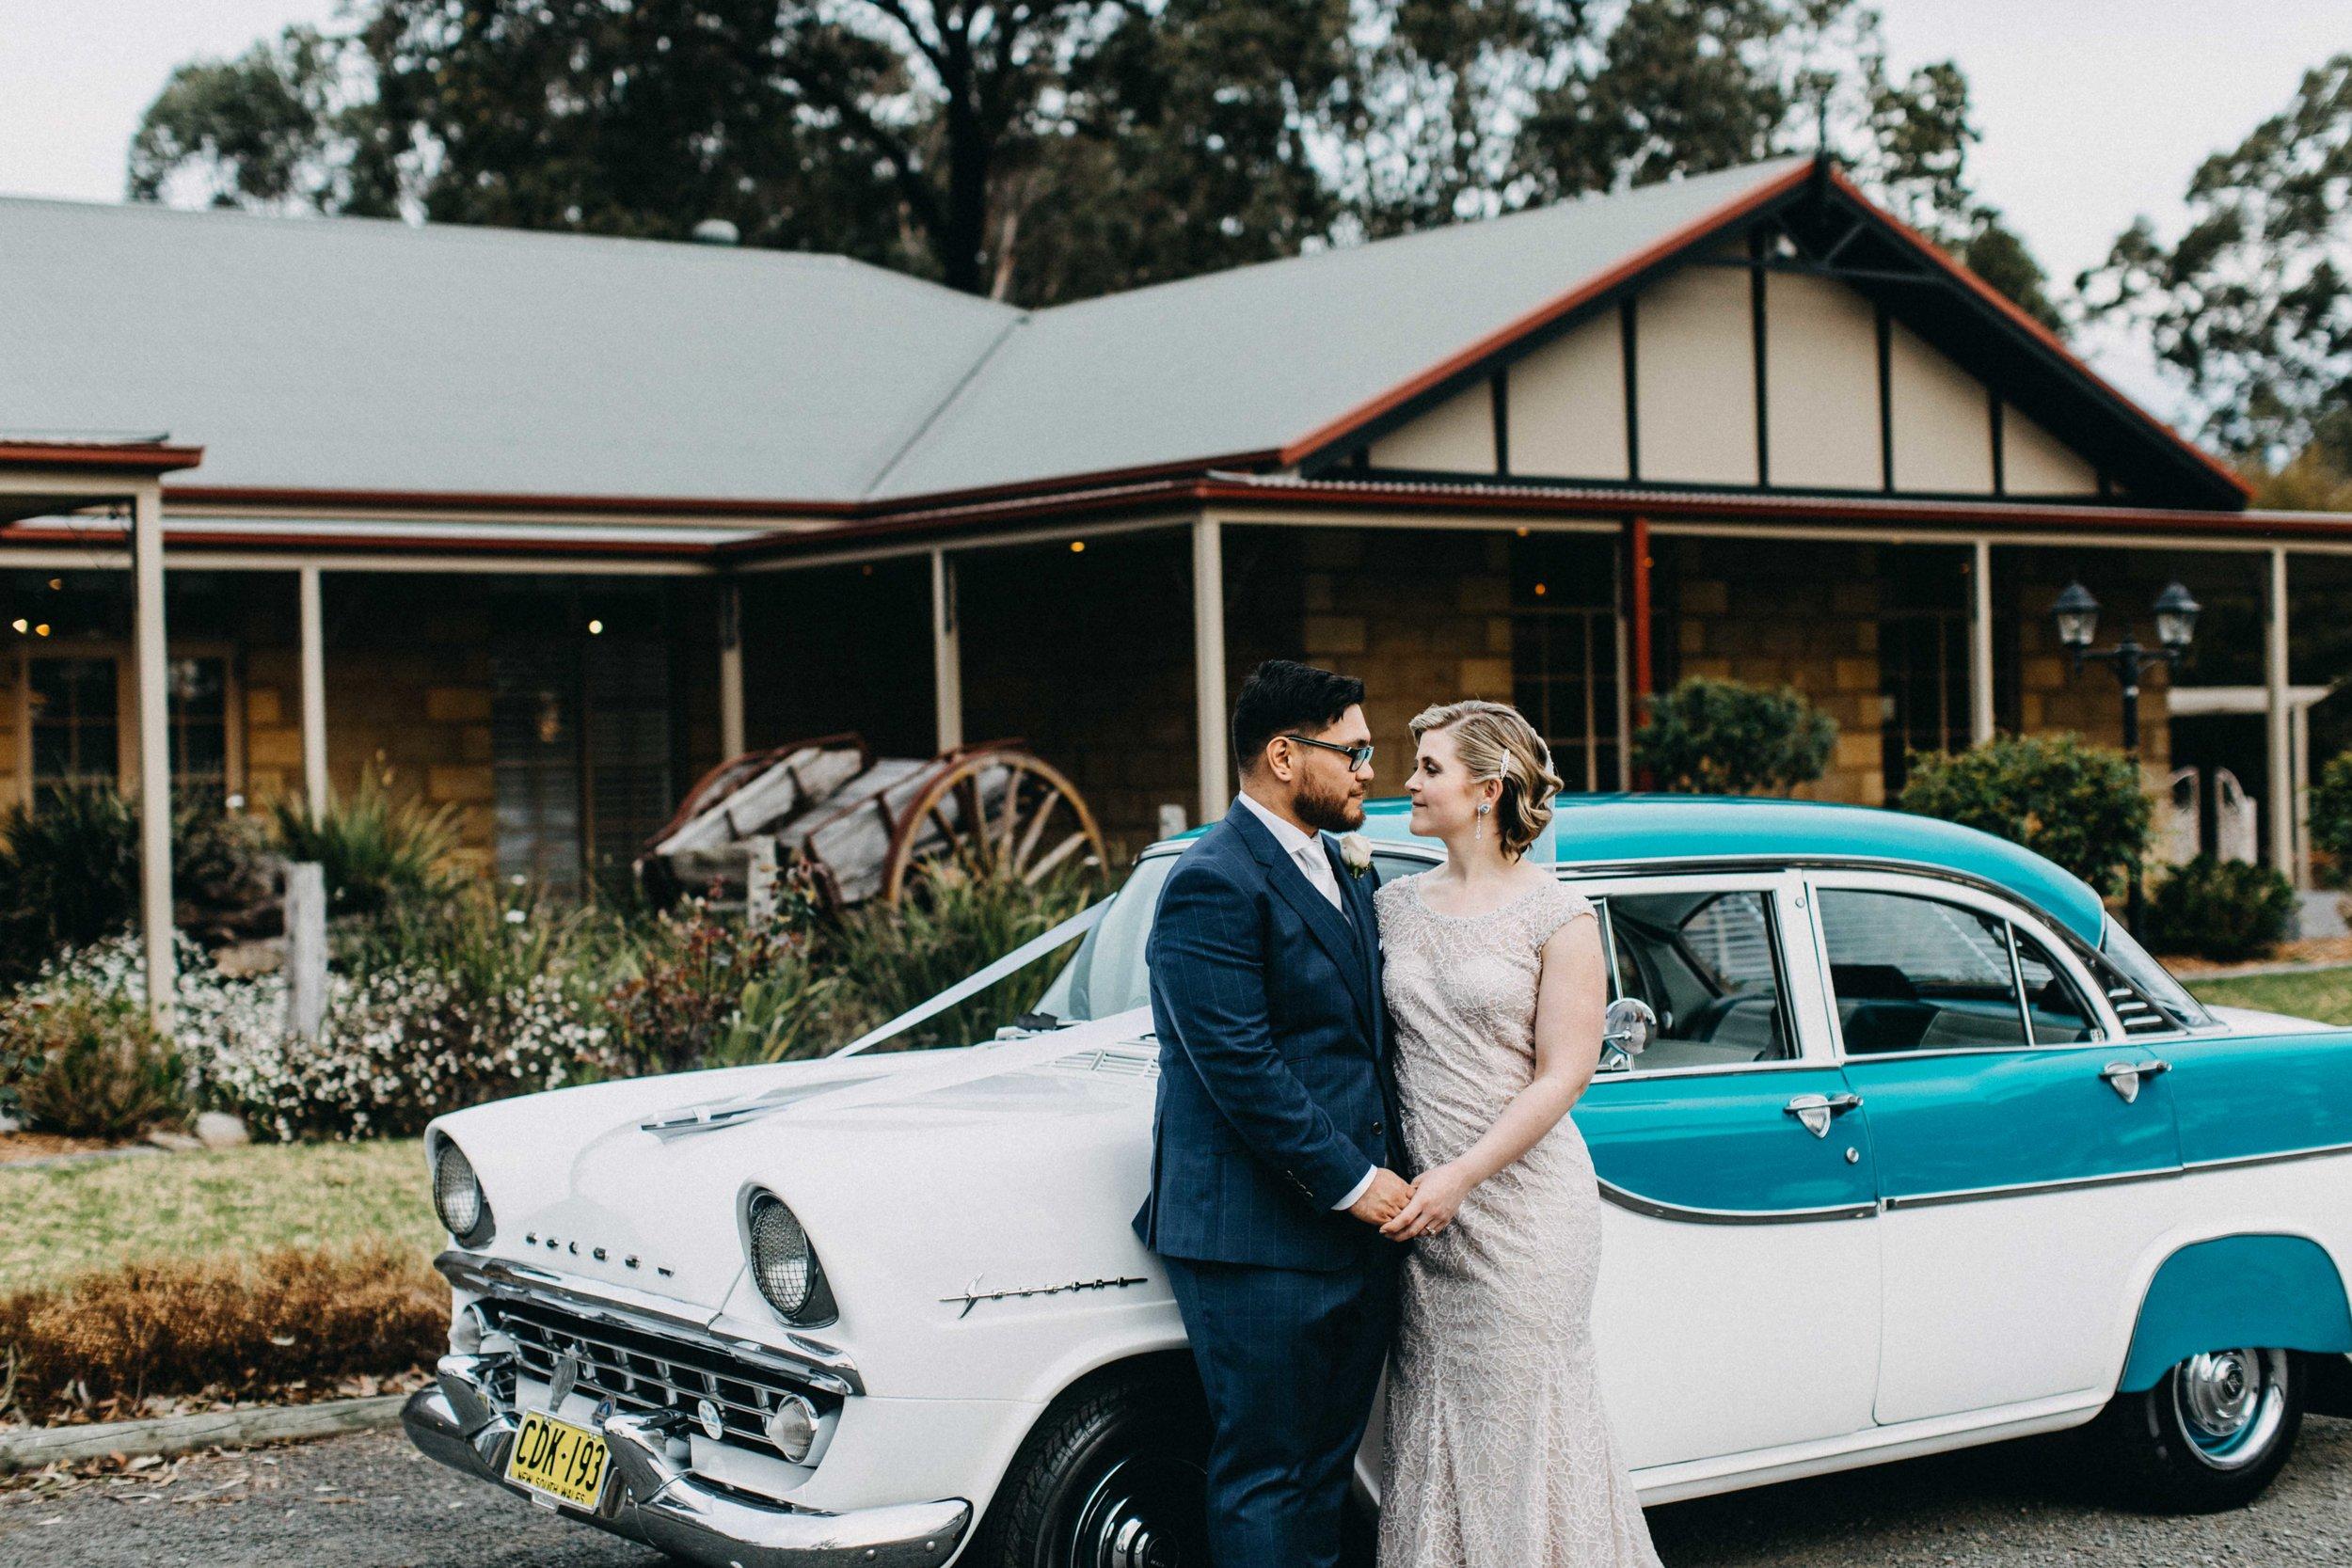 appin-house-wedding-macarthur-www.emilyobrienphotography.net-134.jpg